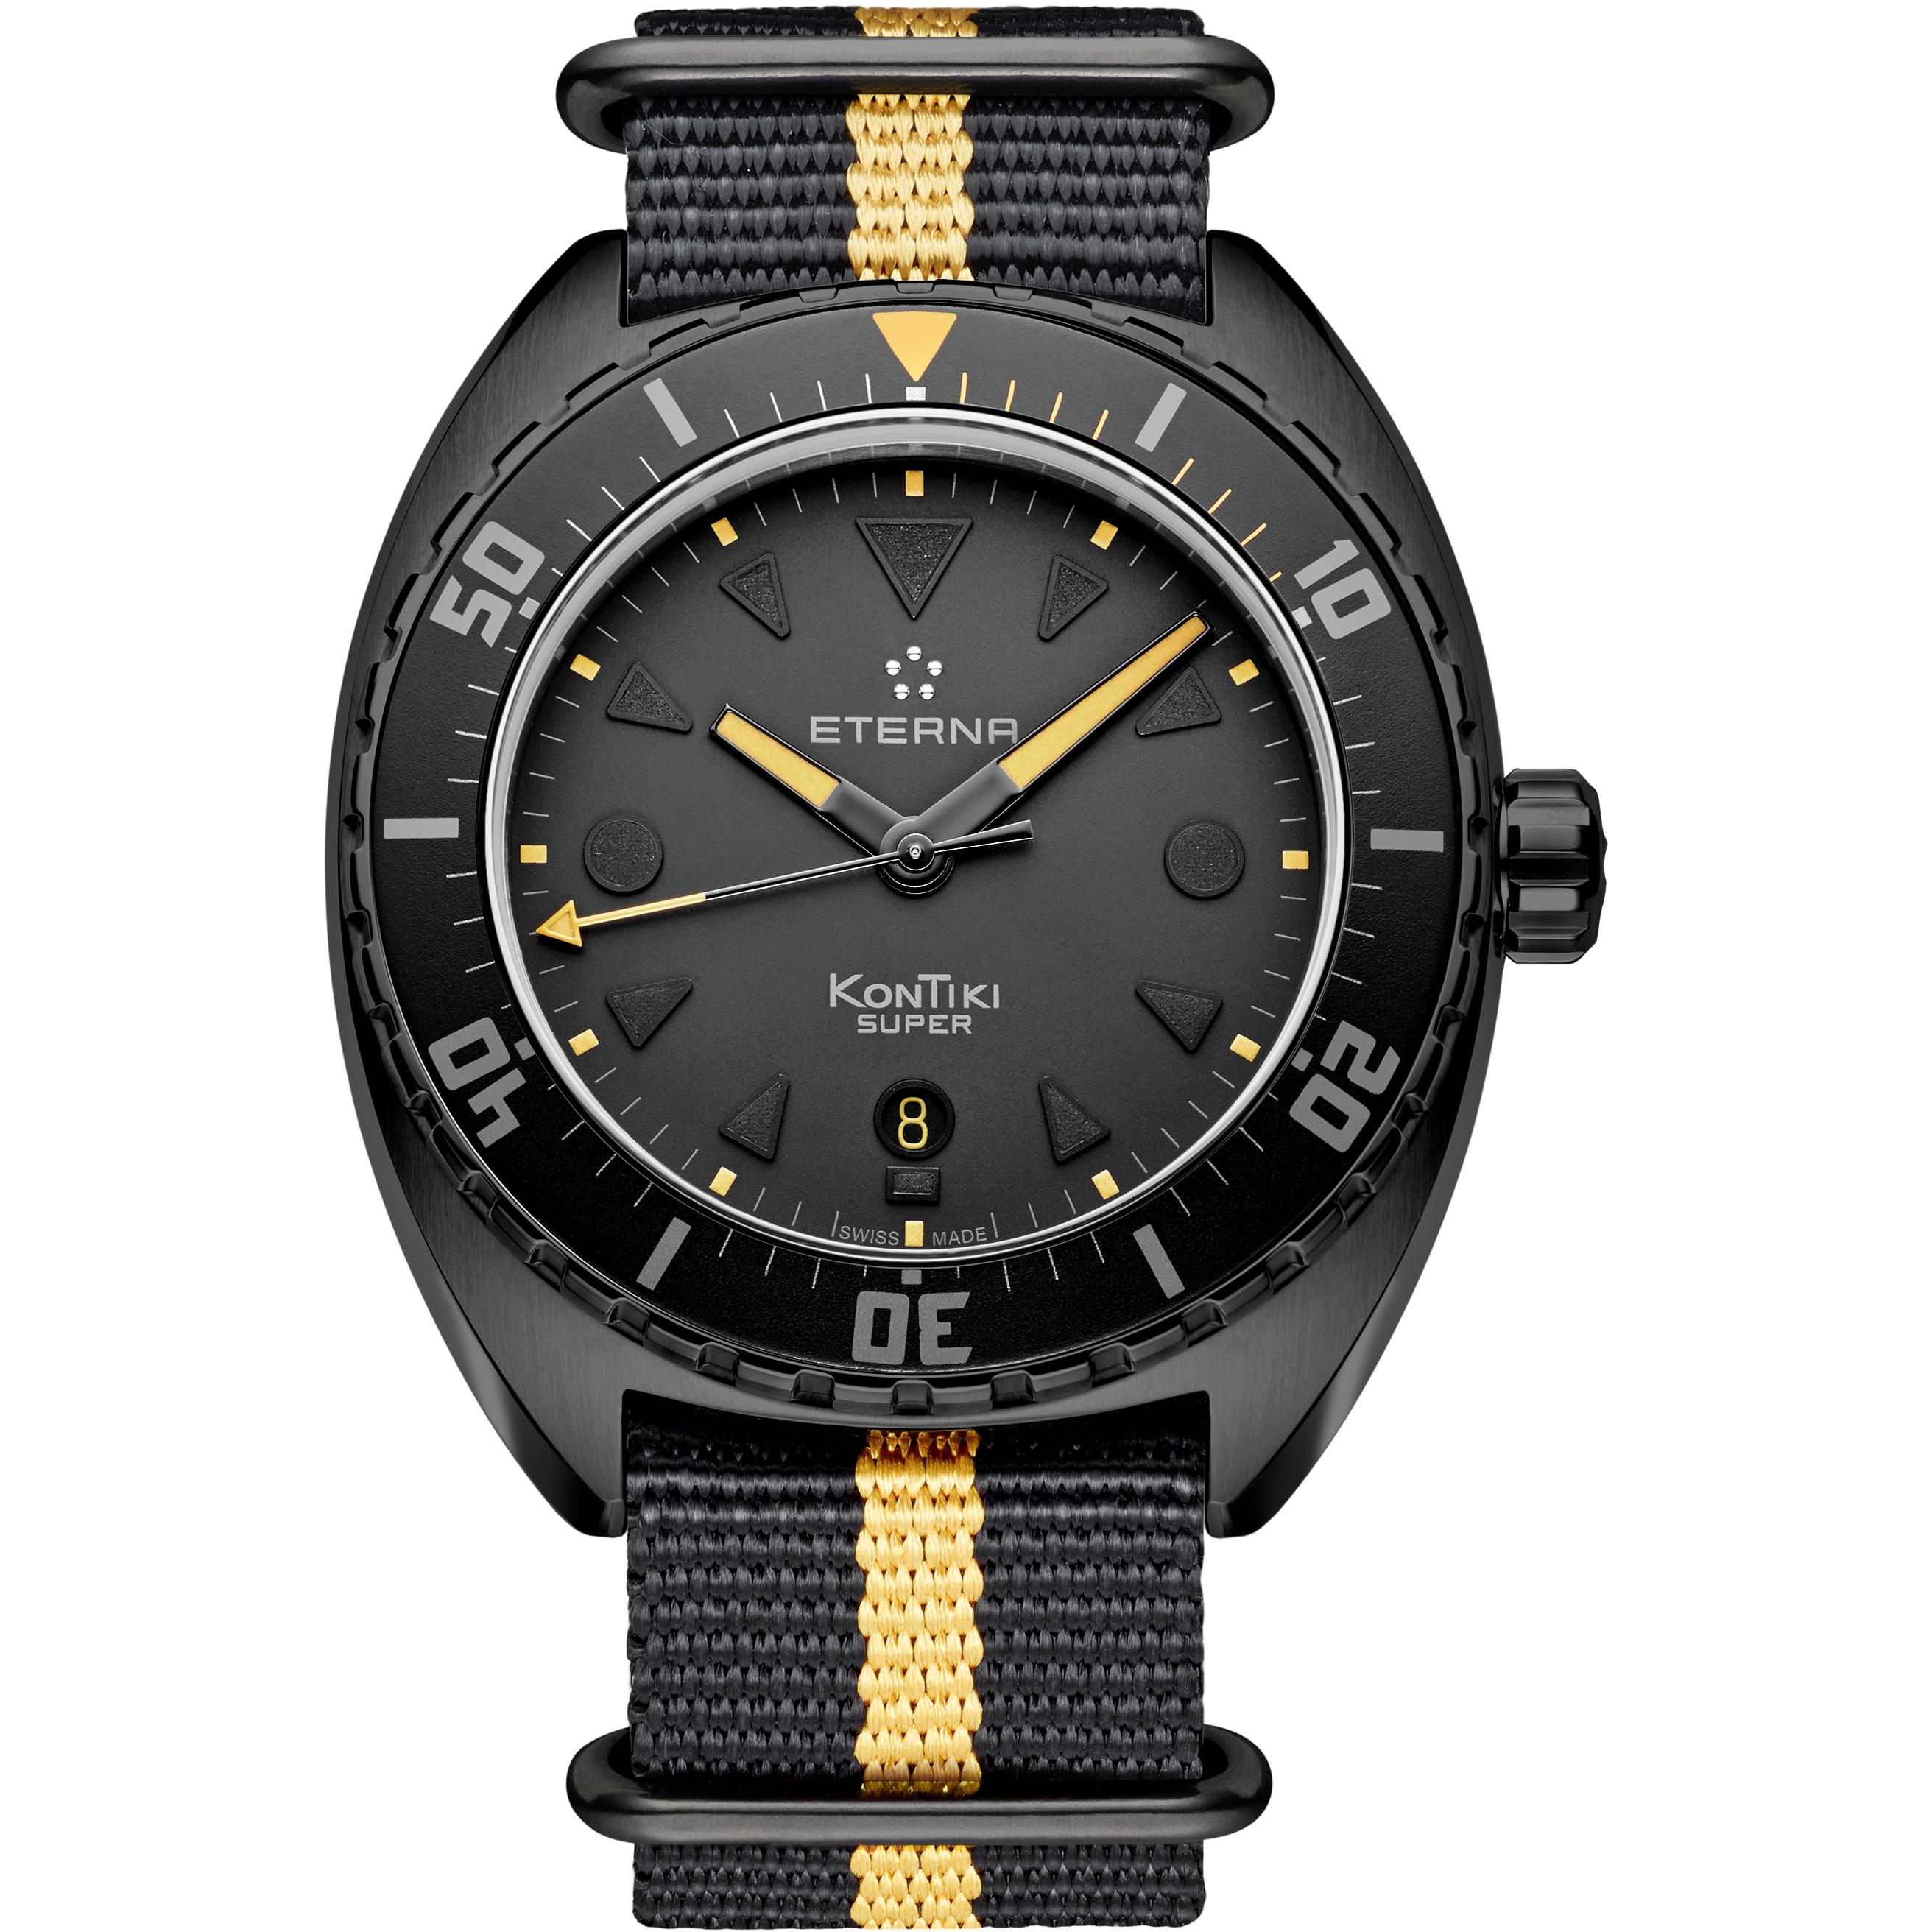 ae13c7b72db Gents Eterna Super Kon Tiki Black Limited Edition Watch (1273.43.41.1365)